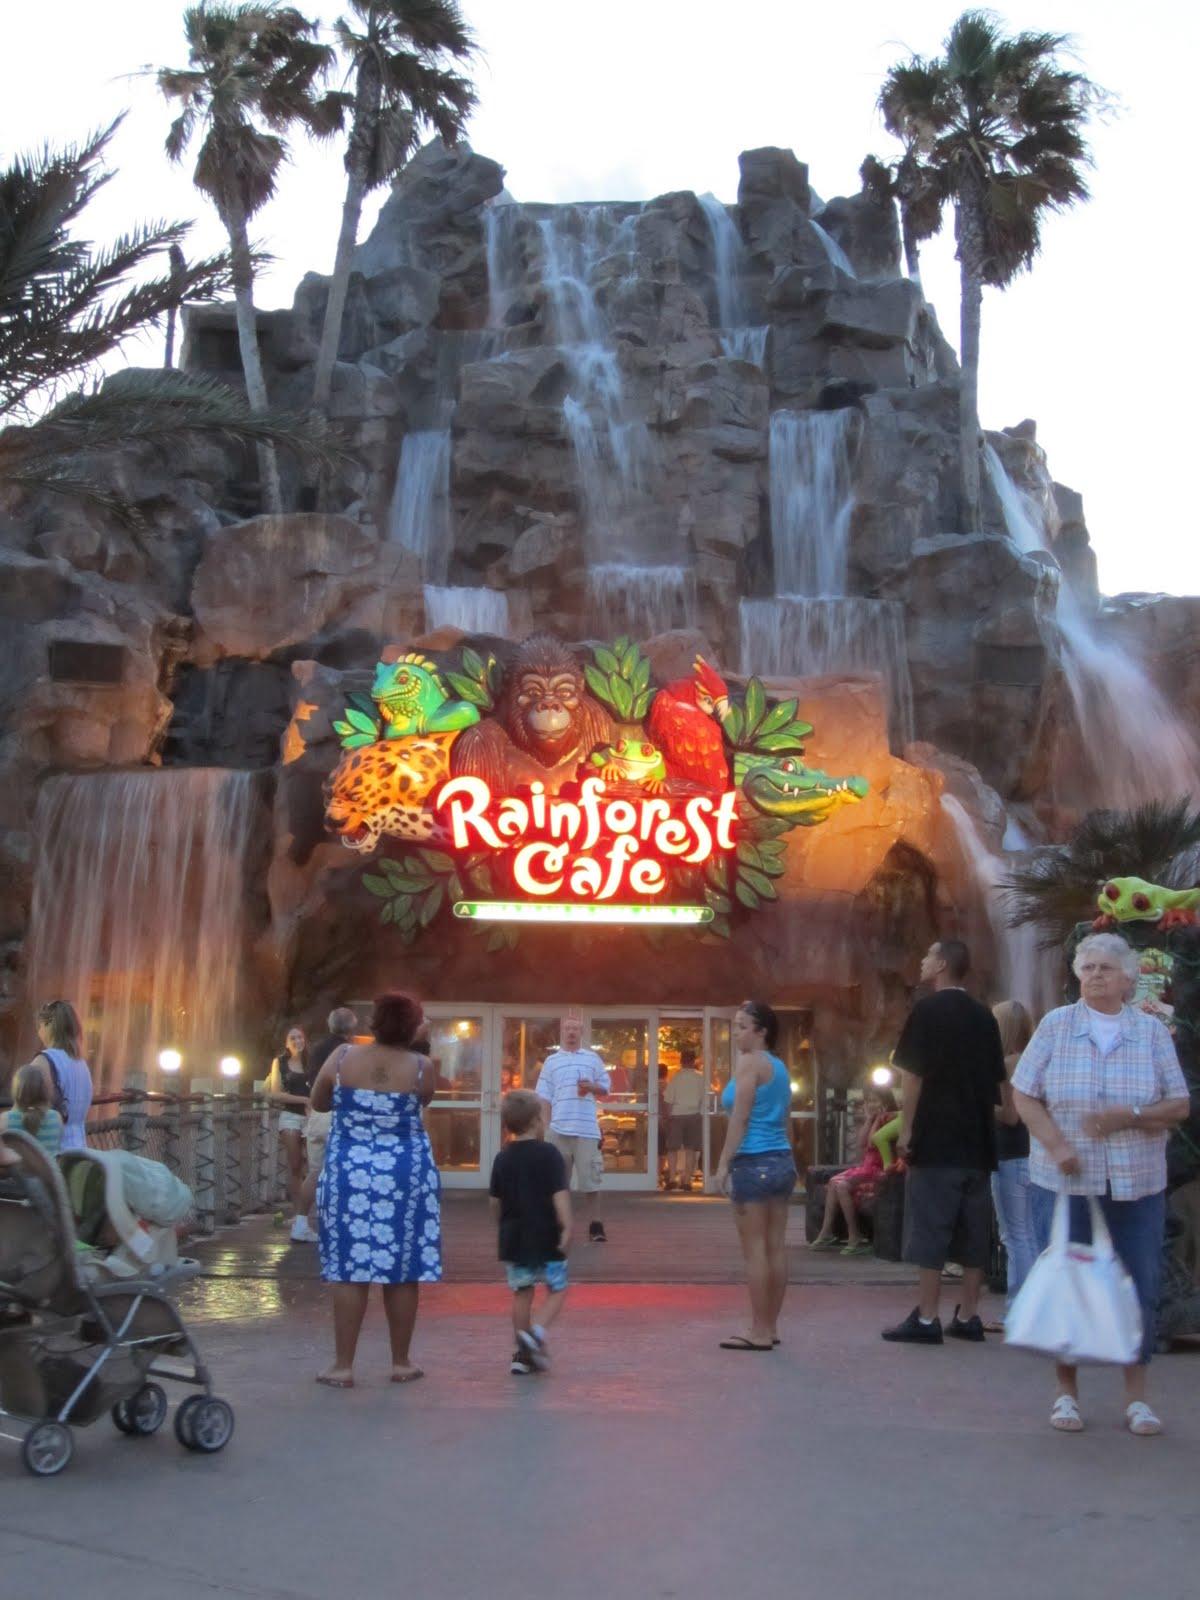 Where Is Brandy Rainforest Cafe In Galveston Texas